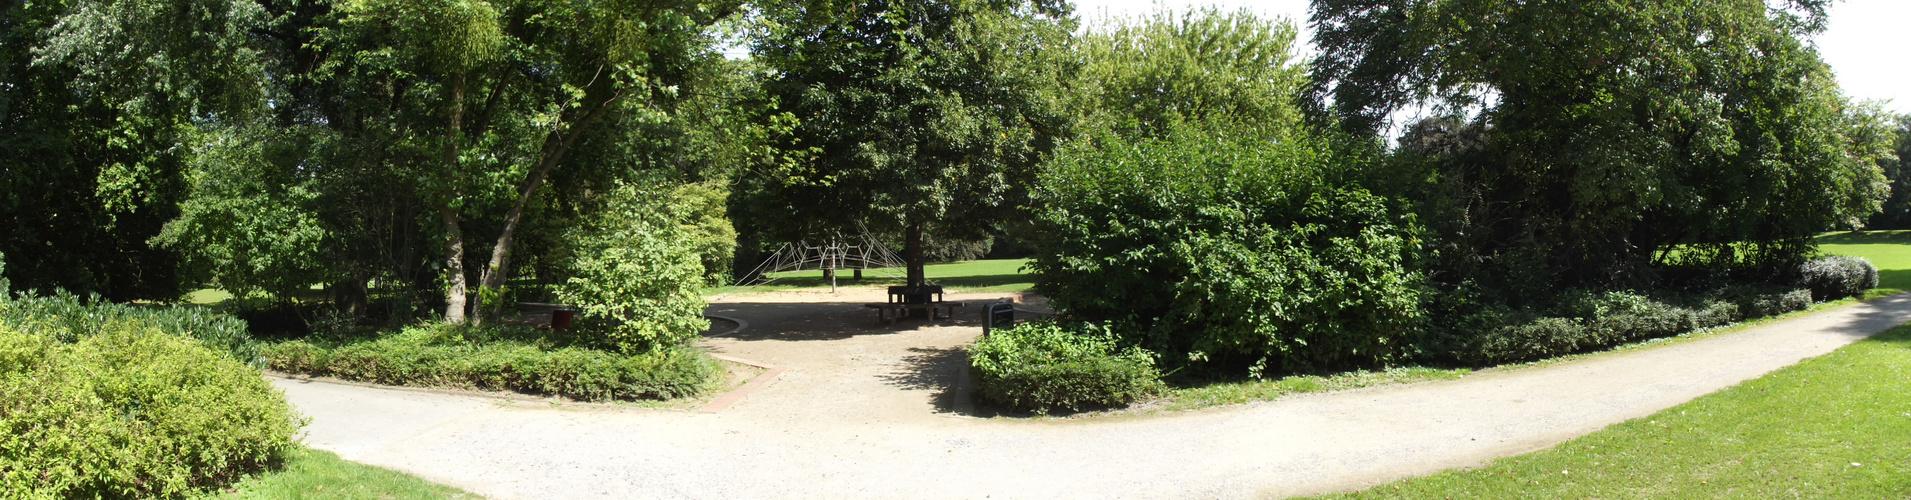 Park-Düsseldorf Holthausen